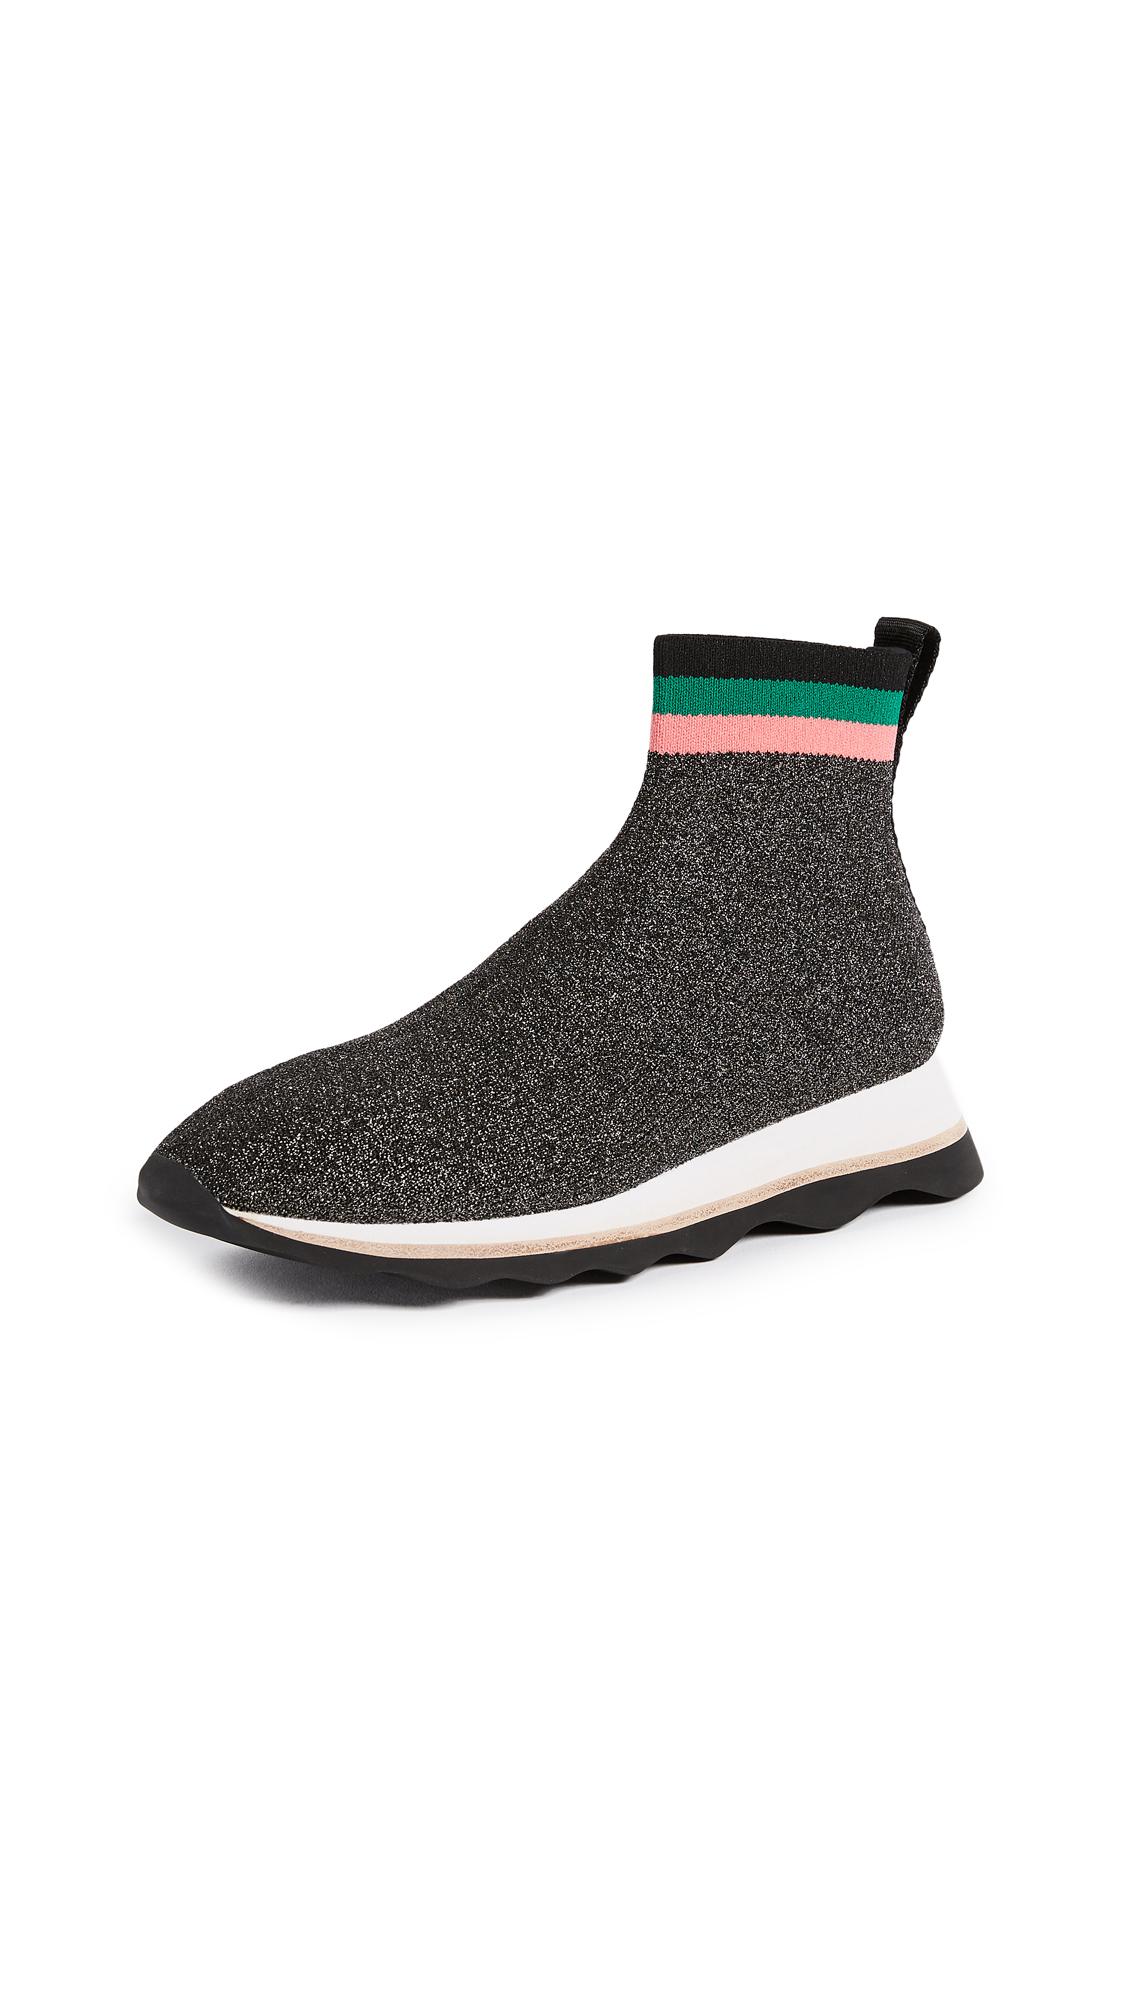 Loeffler Randall Scout Sneakers - Black/Silver/Multi